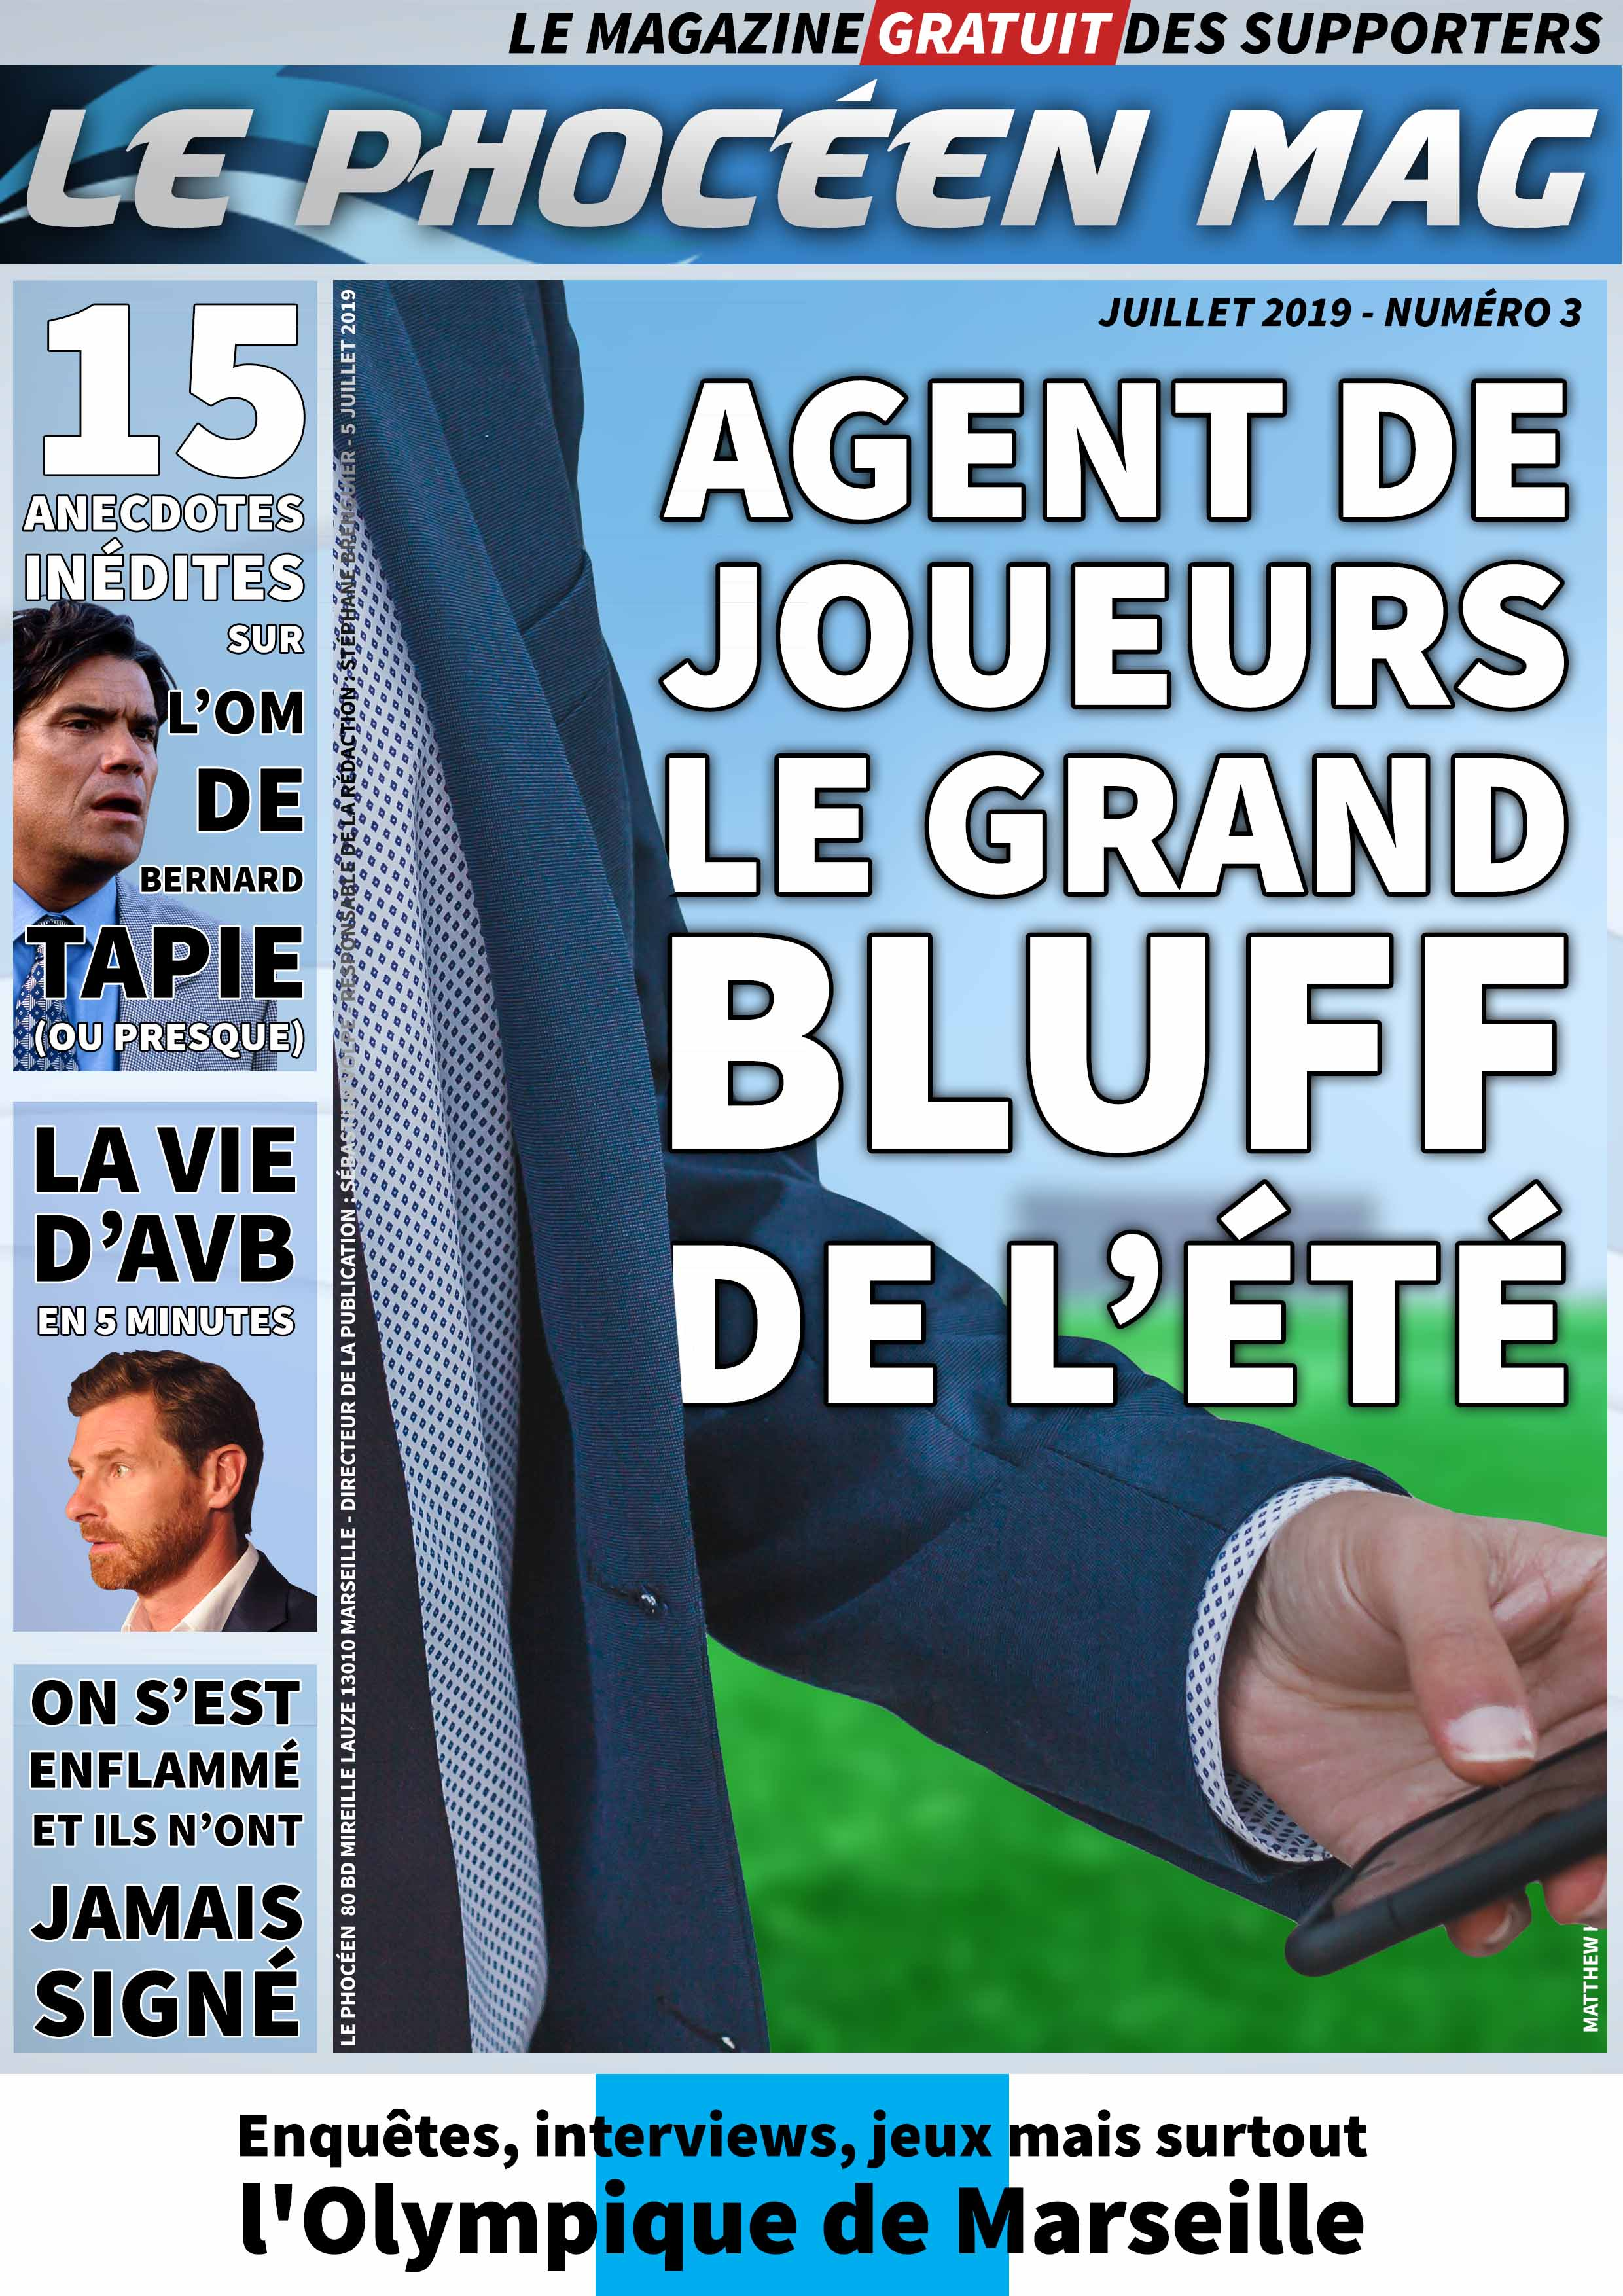 190704_une_magazine_juillet.jpg (619 KB)